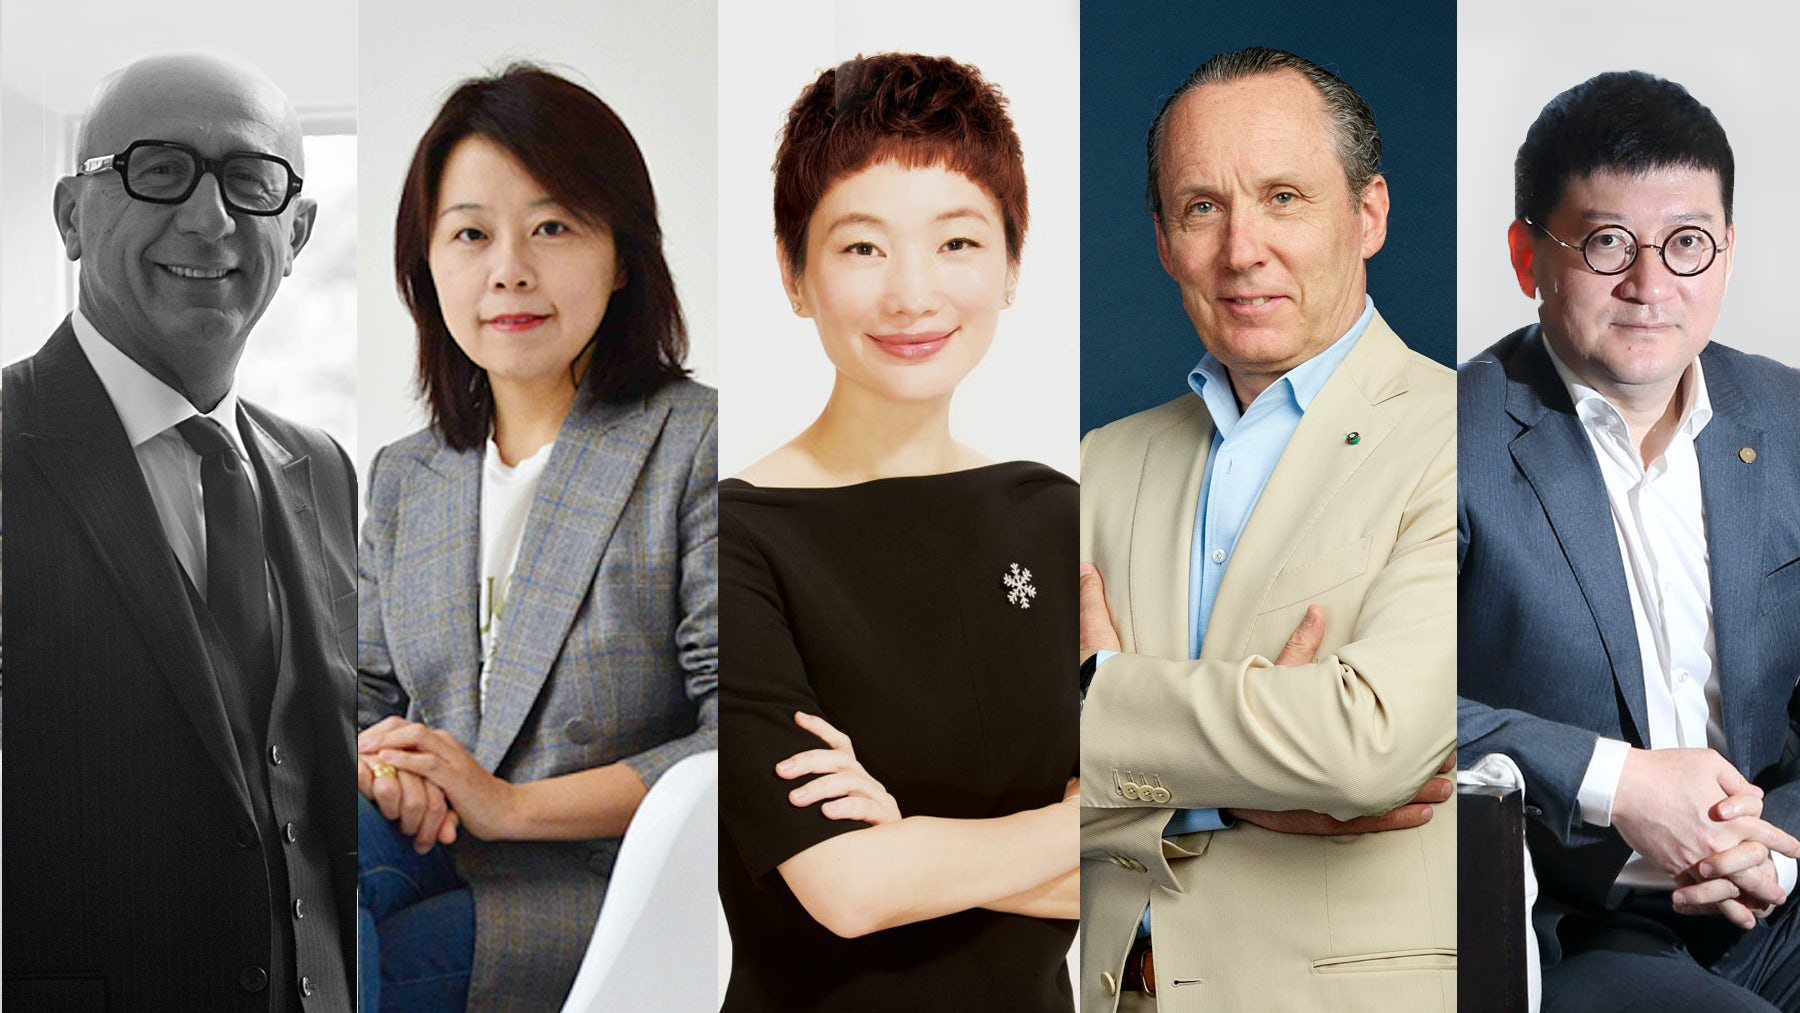 Marco Bizzarri, Jessica Liu, Xiao Xue, Ermenegildo Zegna and Chen Xiaodong | Source: Courtesy